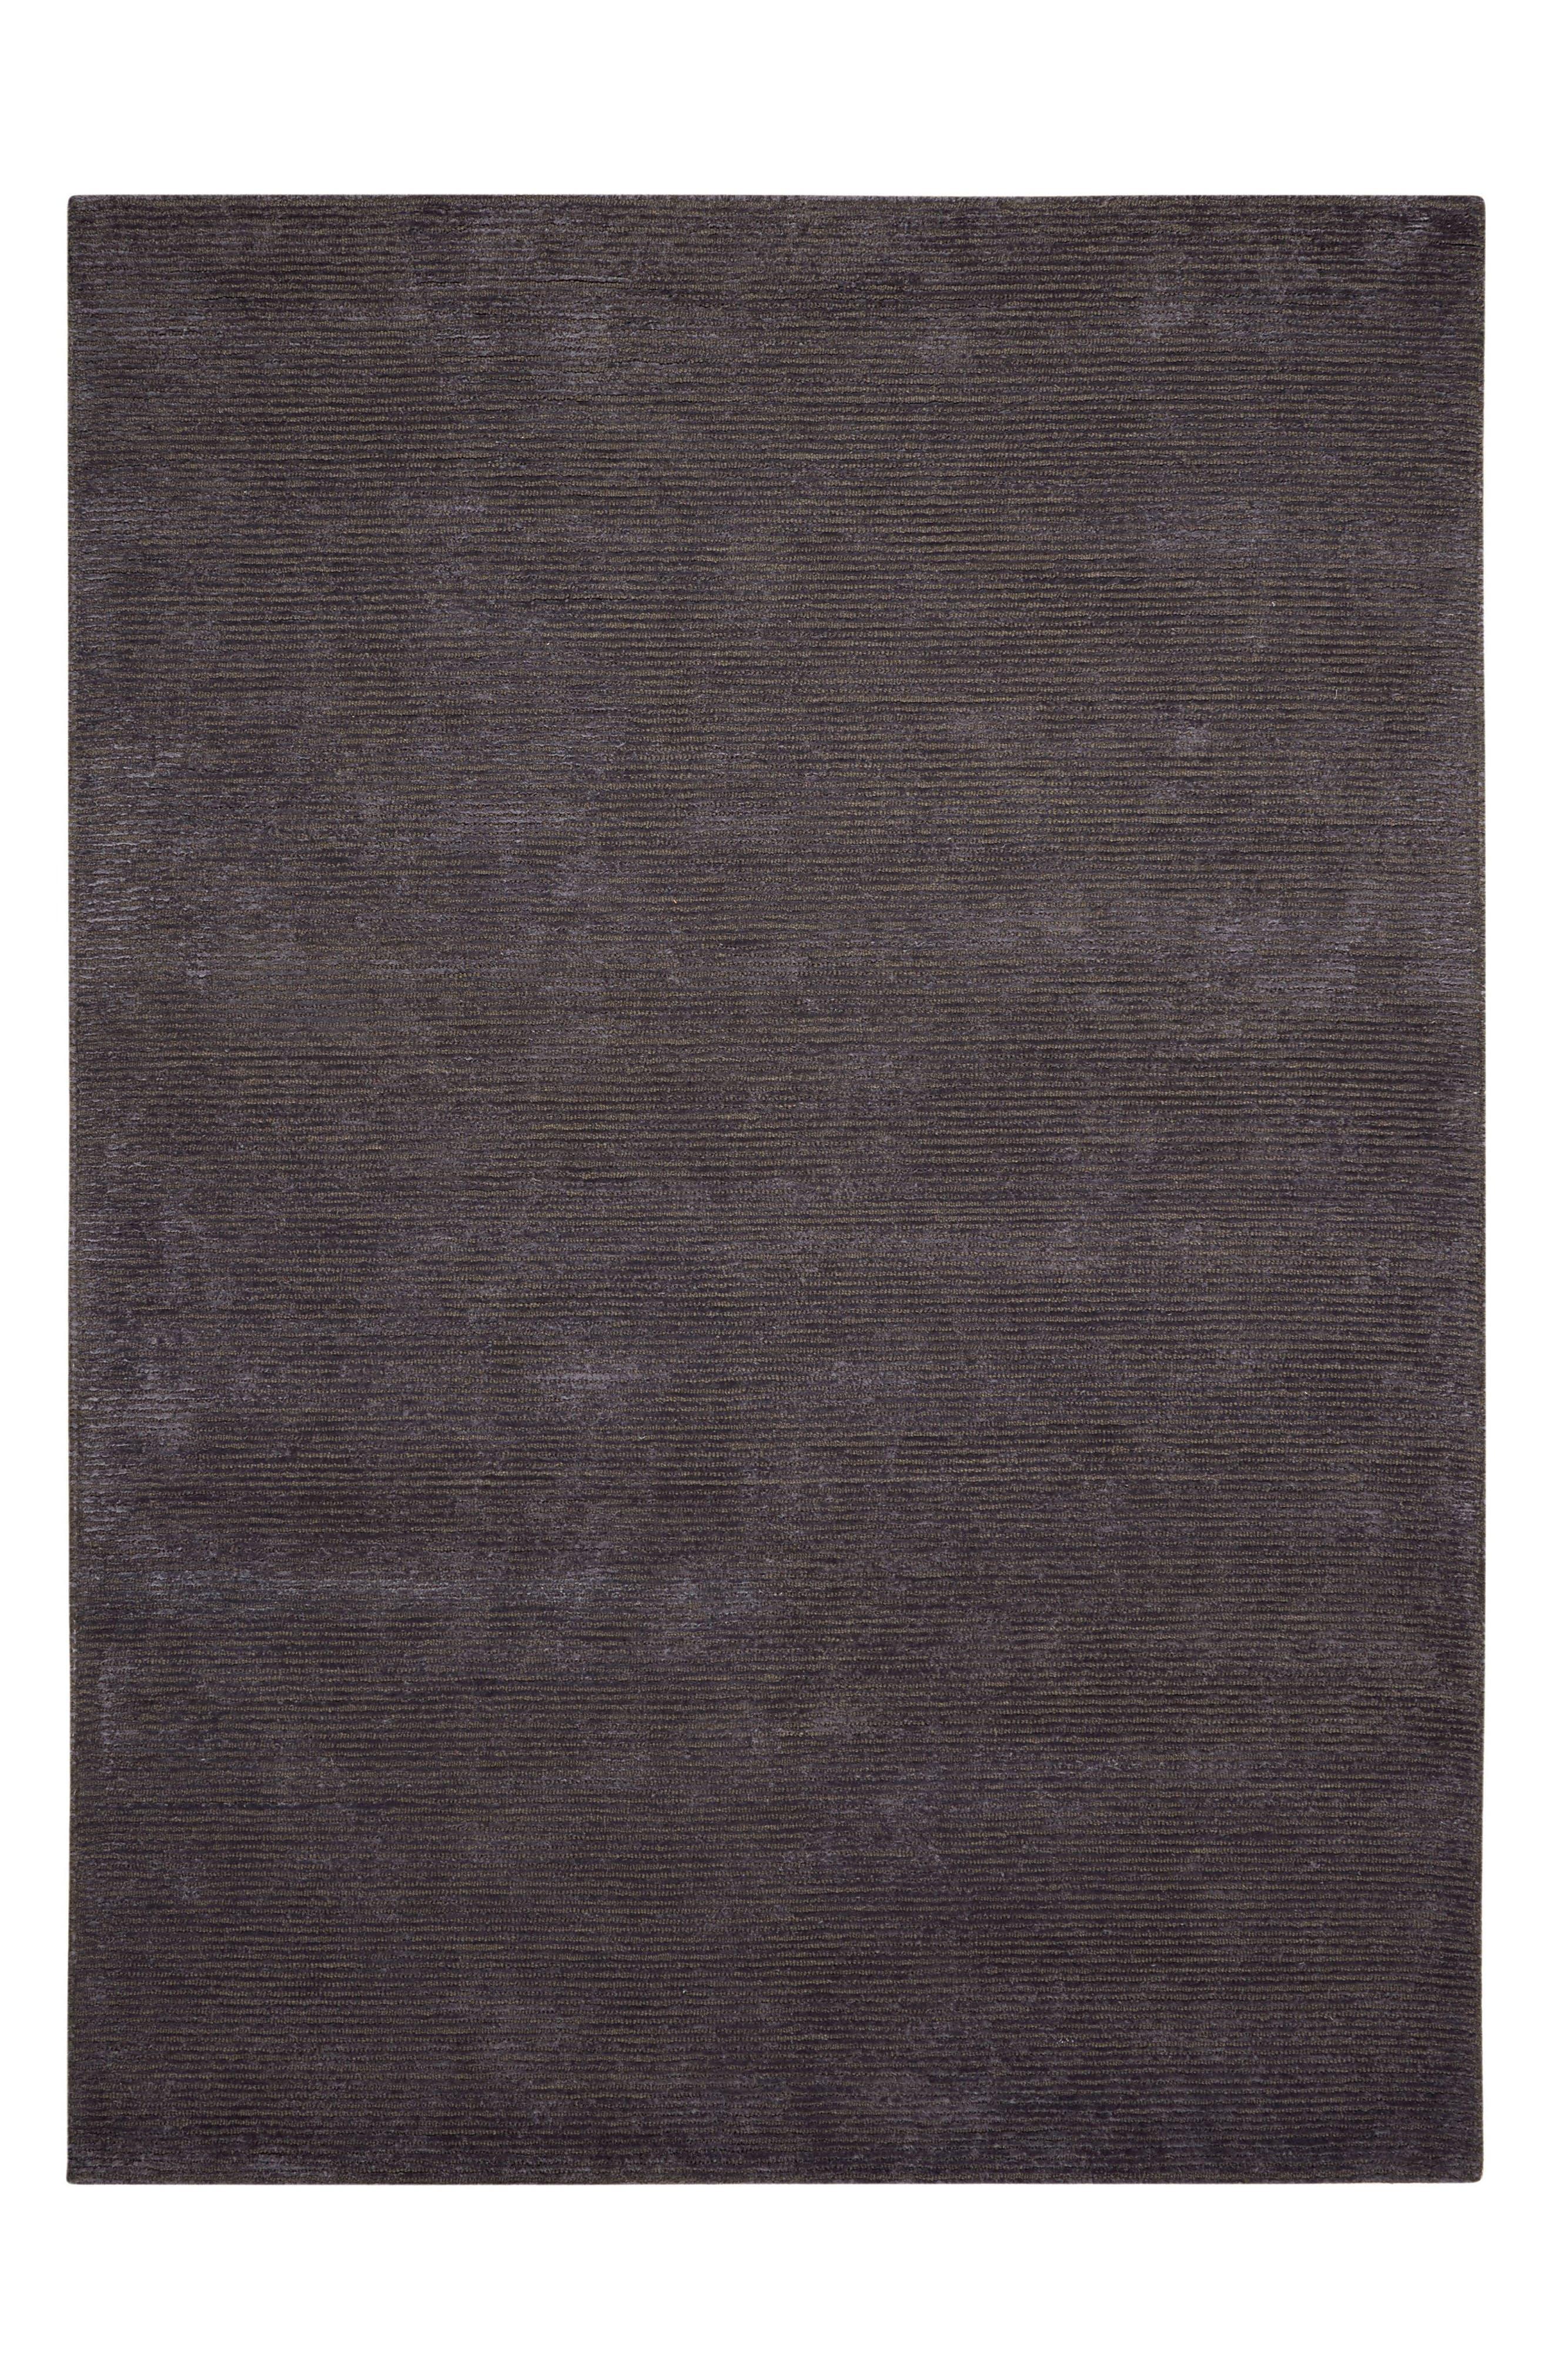 Ravine Furrow Handwoven Area Rug,                         Main,                         color, 001